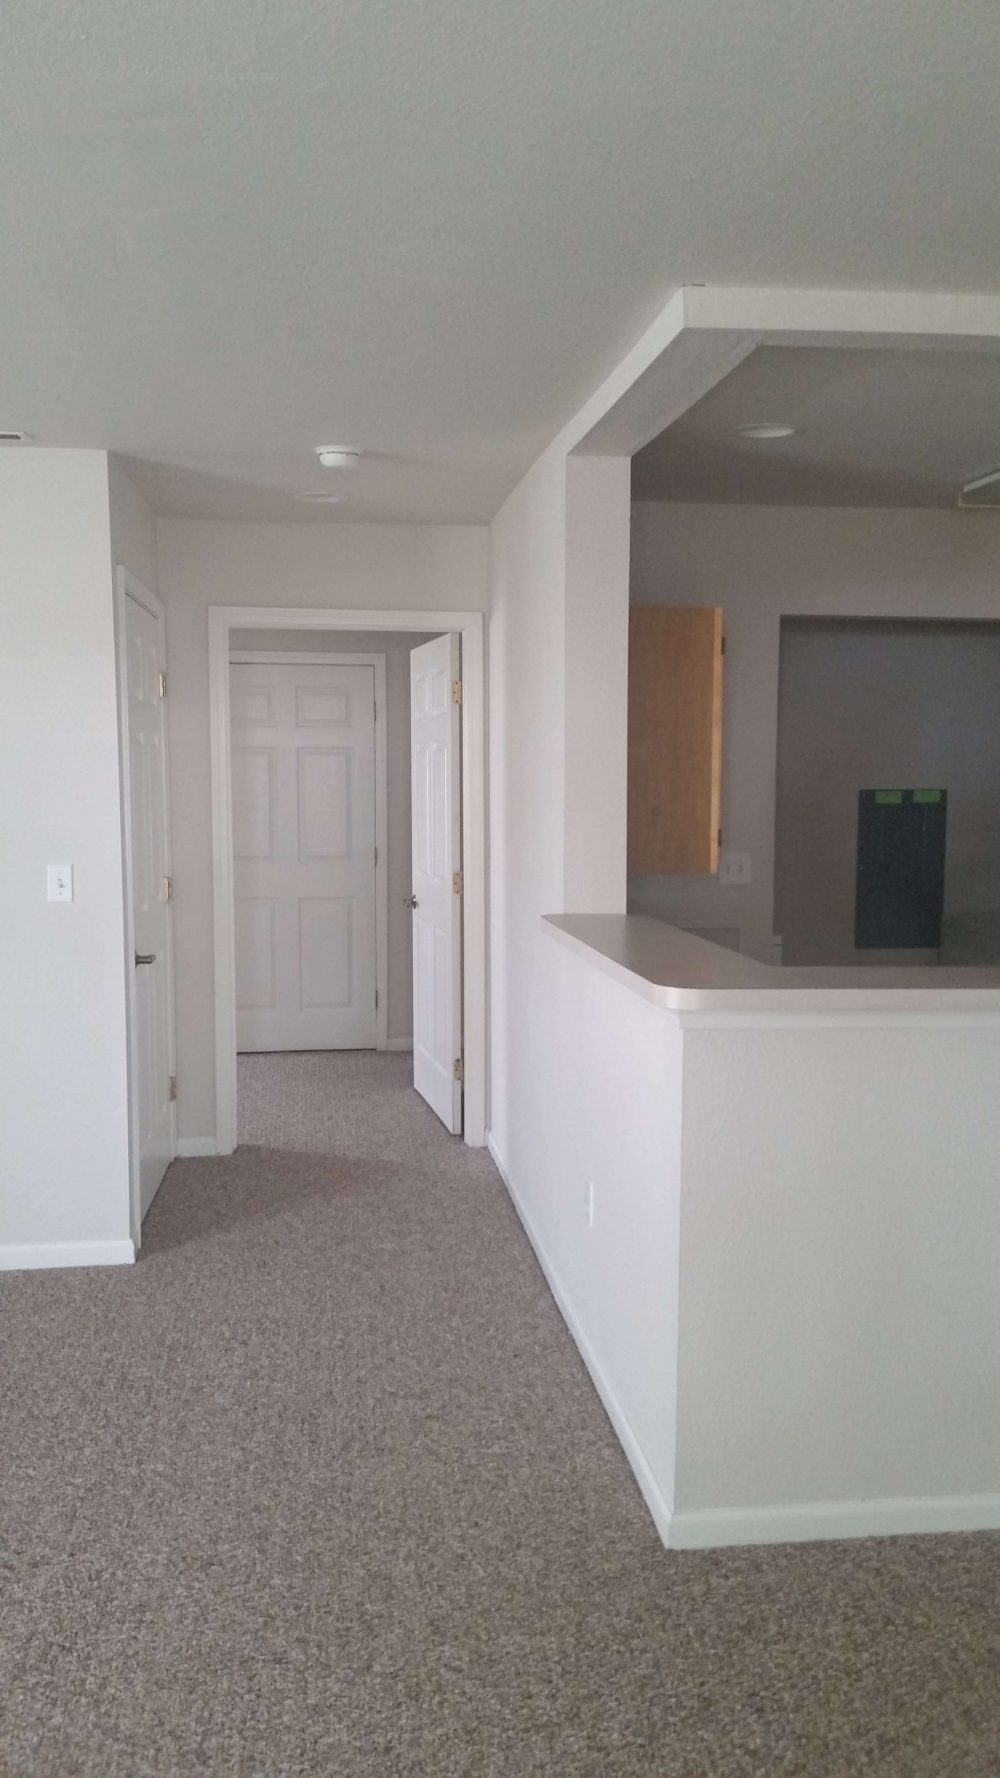 1 bedroom hall